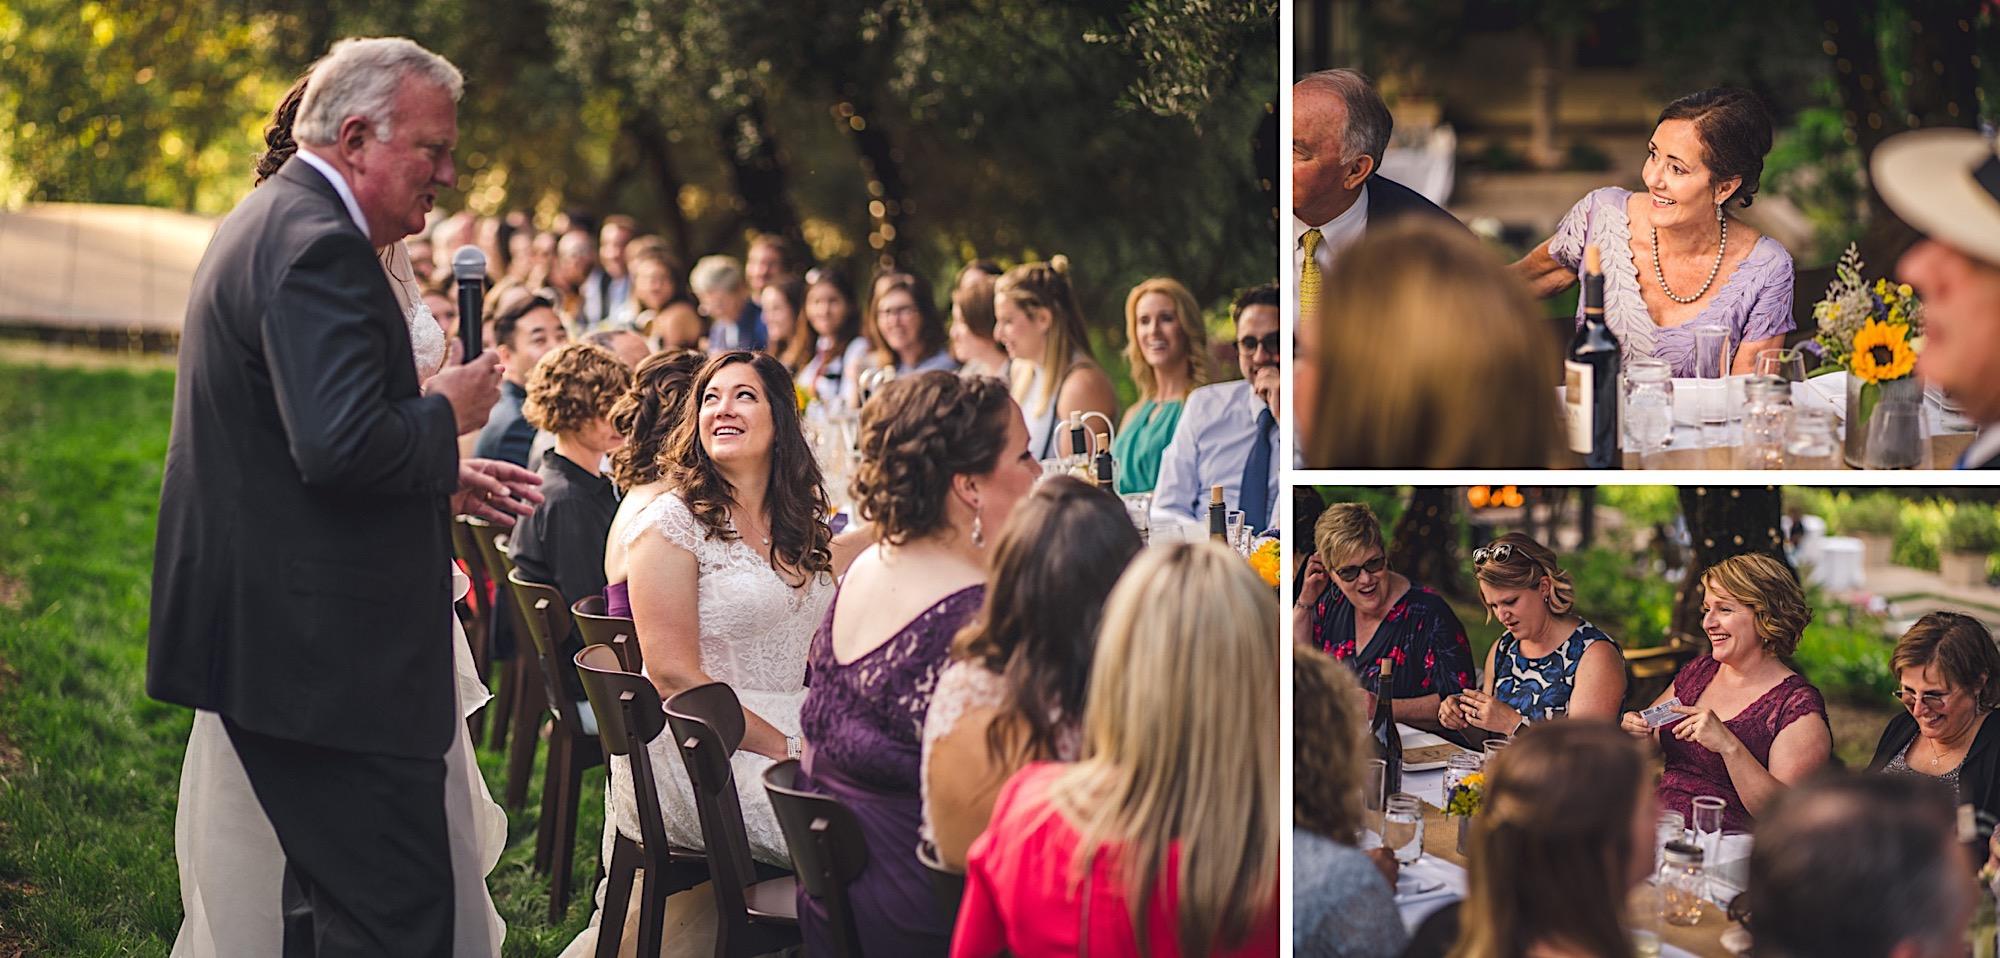 39_candid_photos_in_california_wedding.jpg